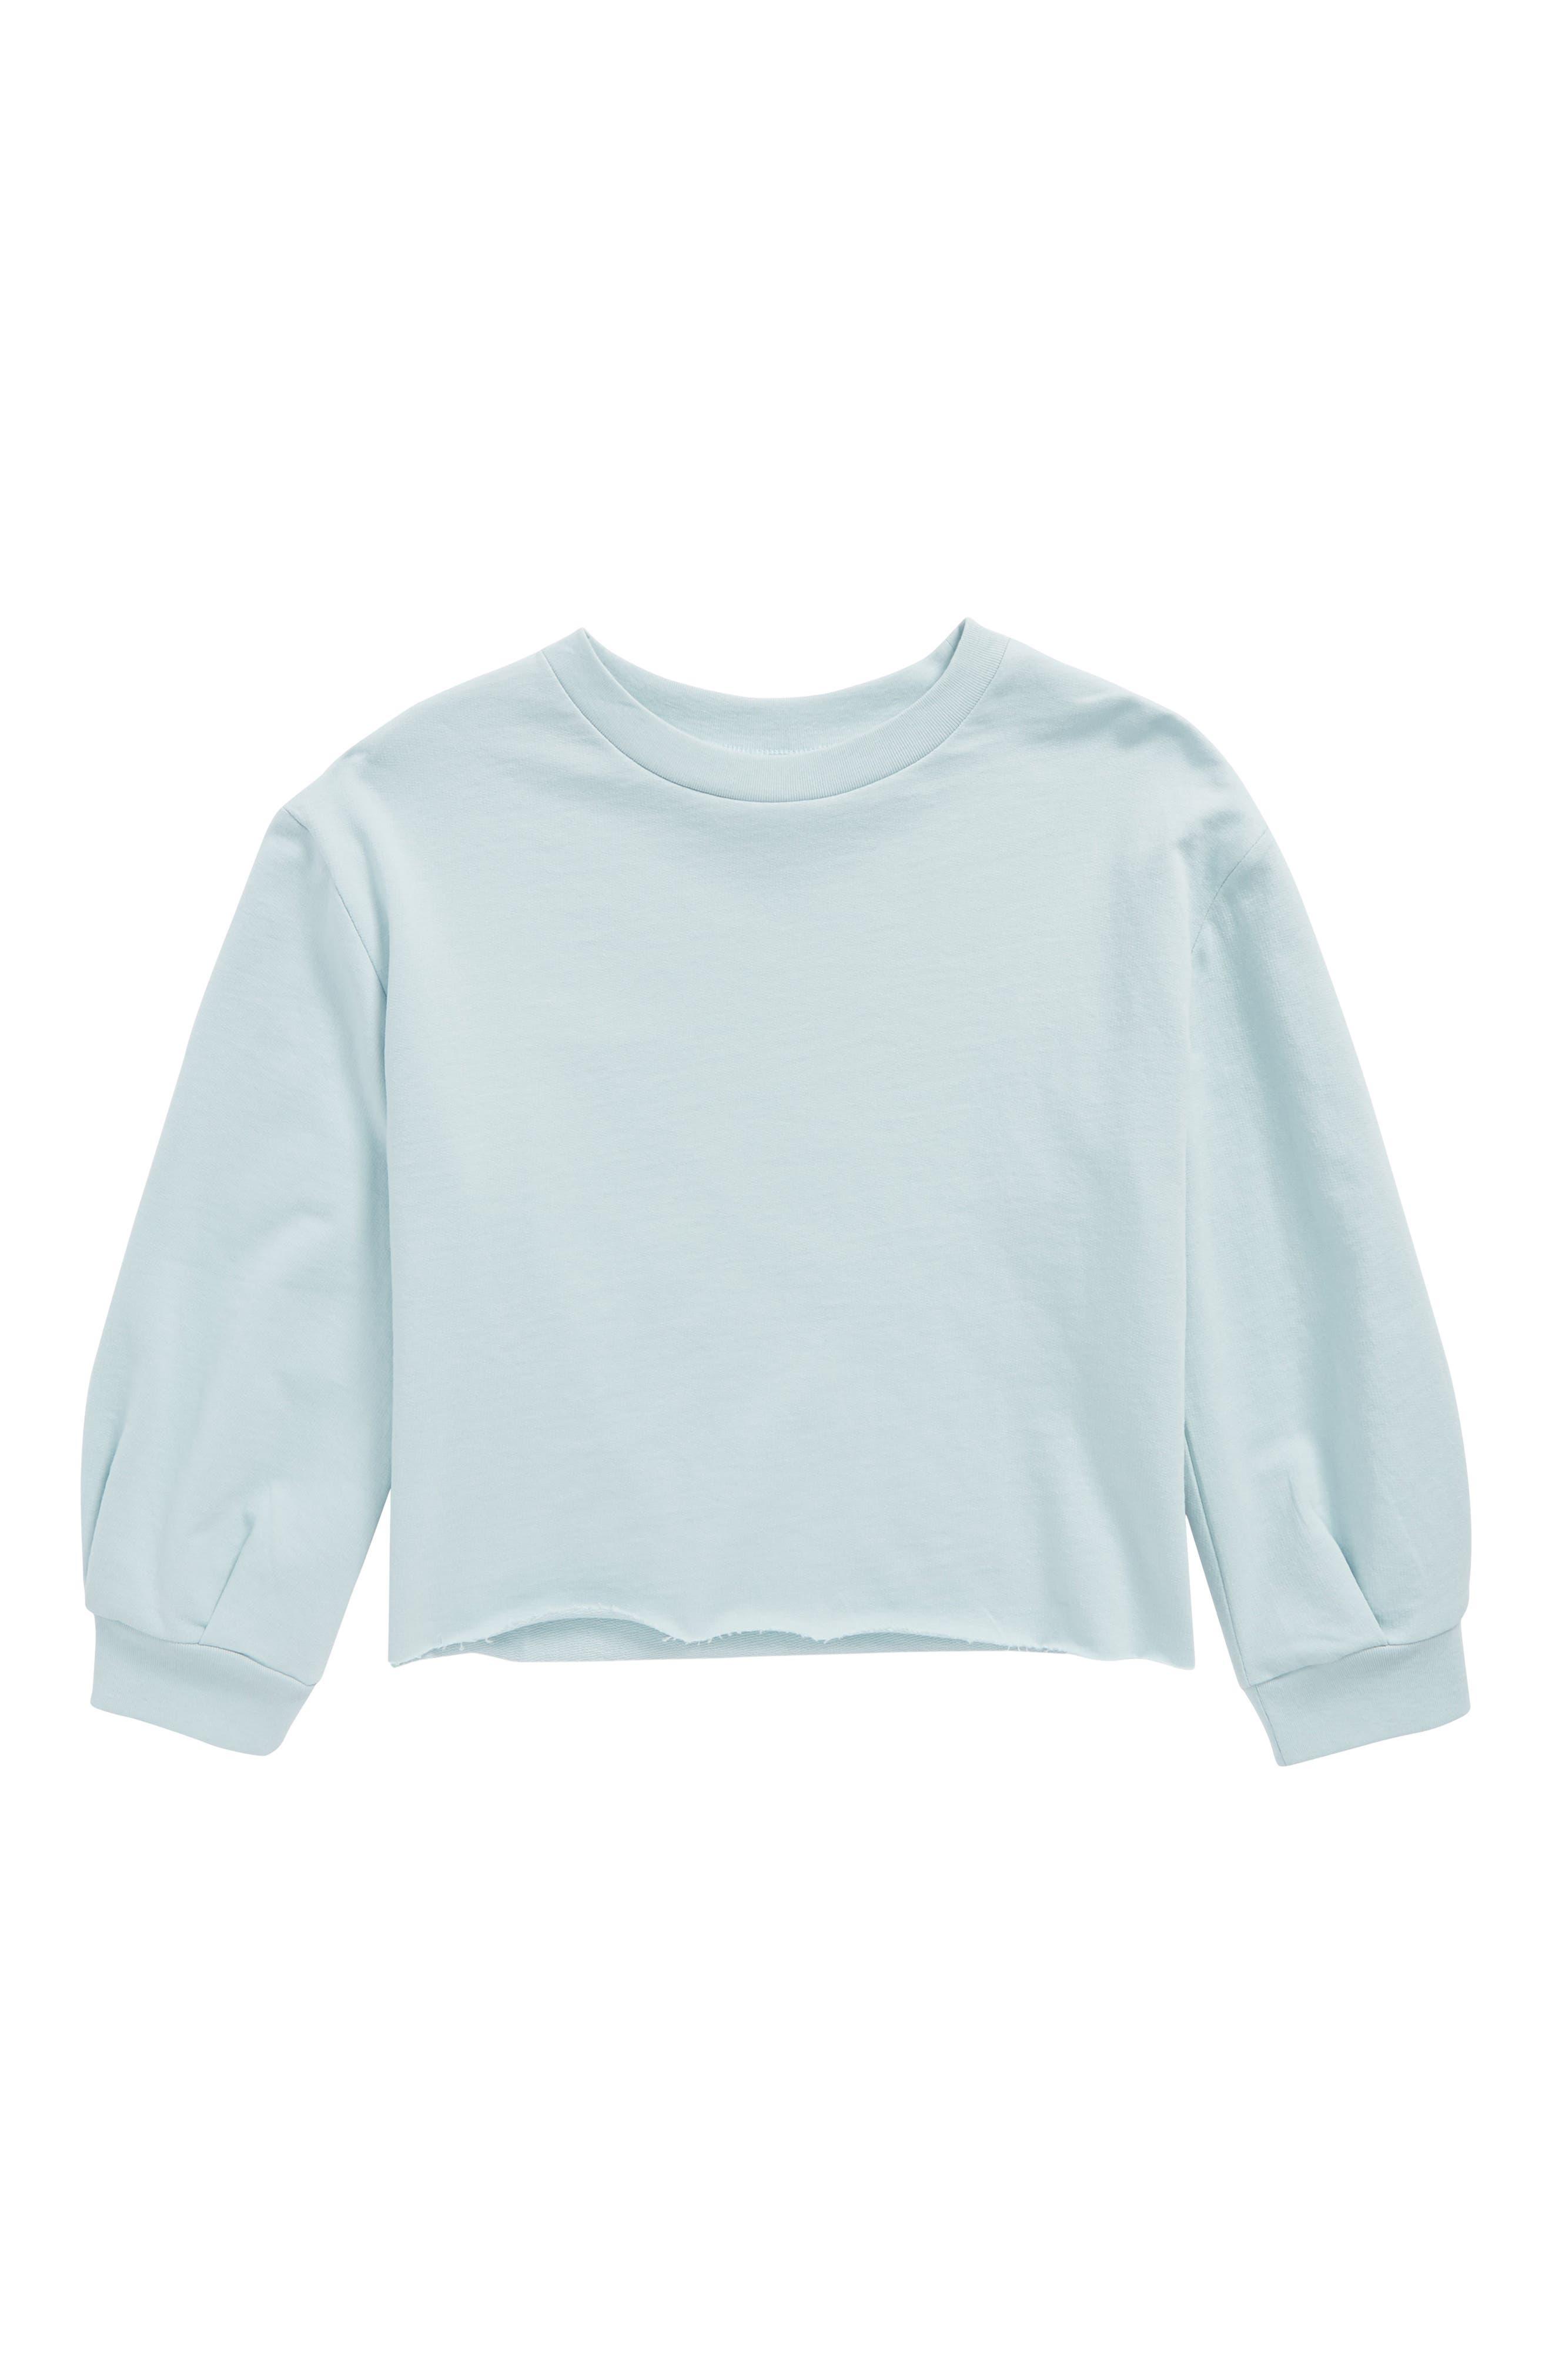 Raw Edge Sweatshirt,                             Main thumbnail 1, color,